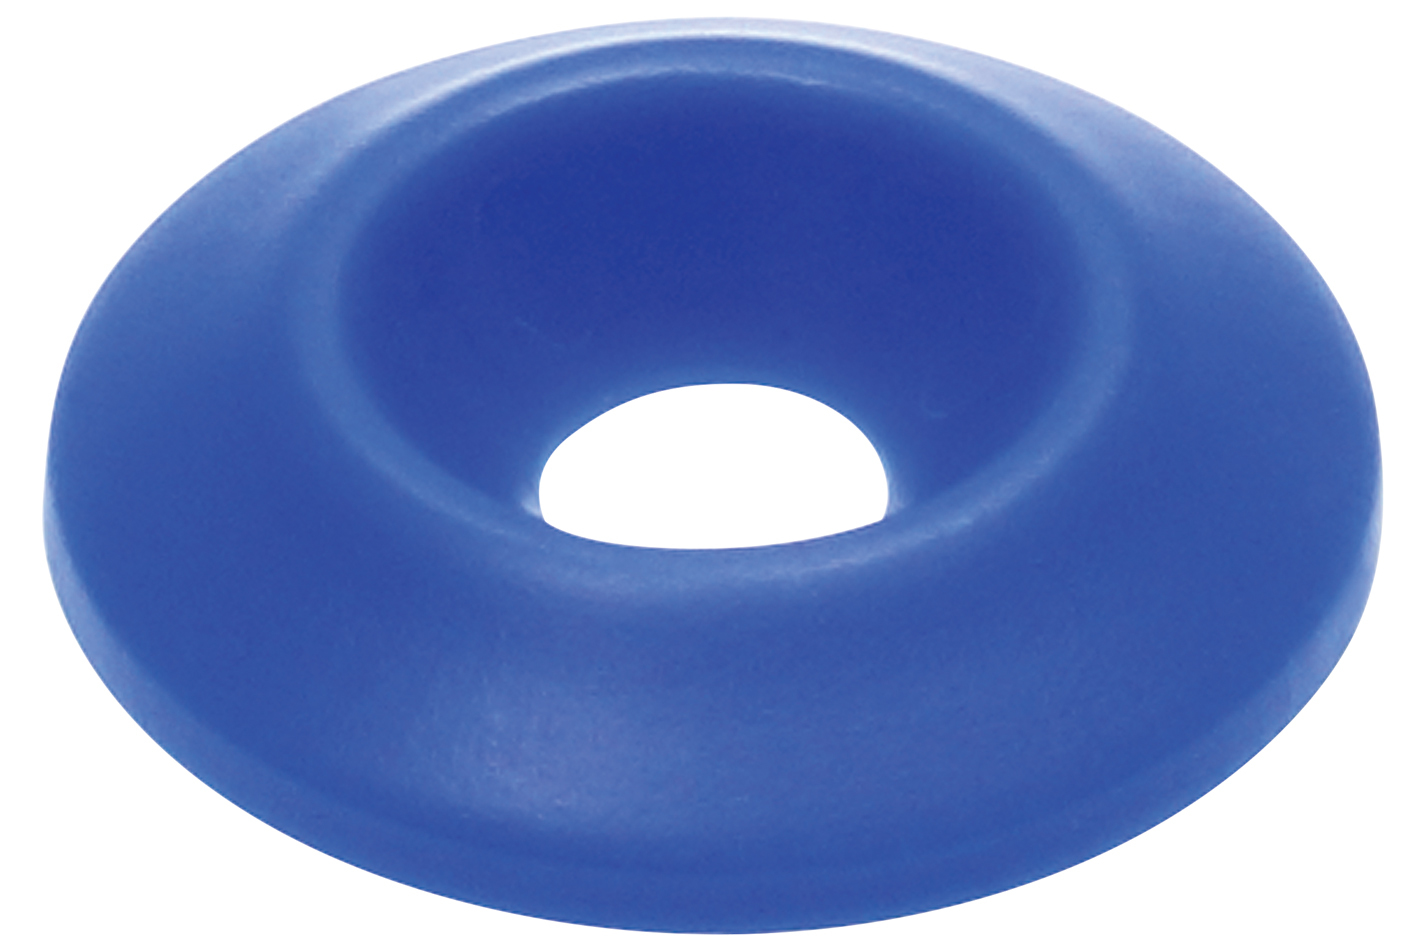 Allstar Performance Countersunk Washer Blue 10pk